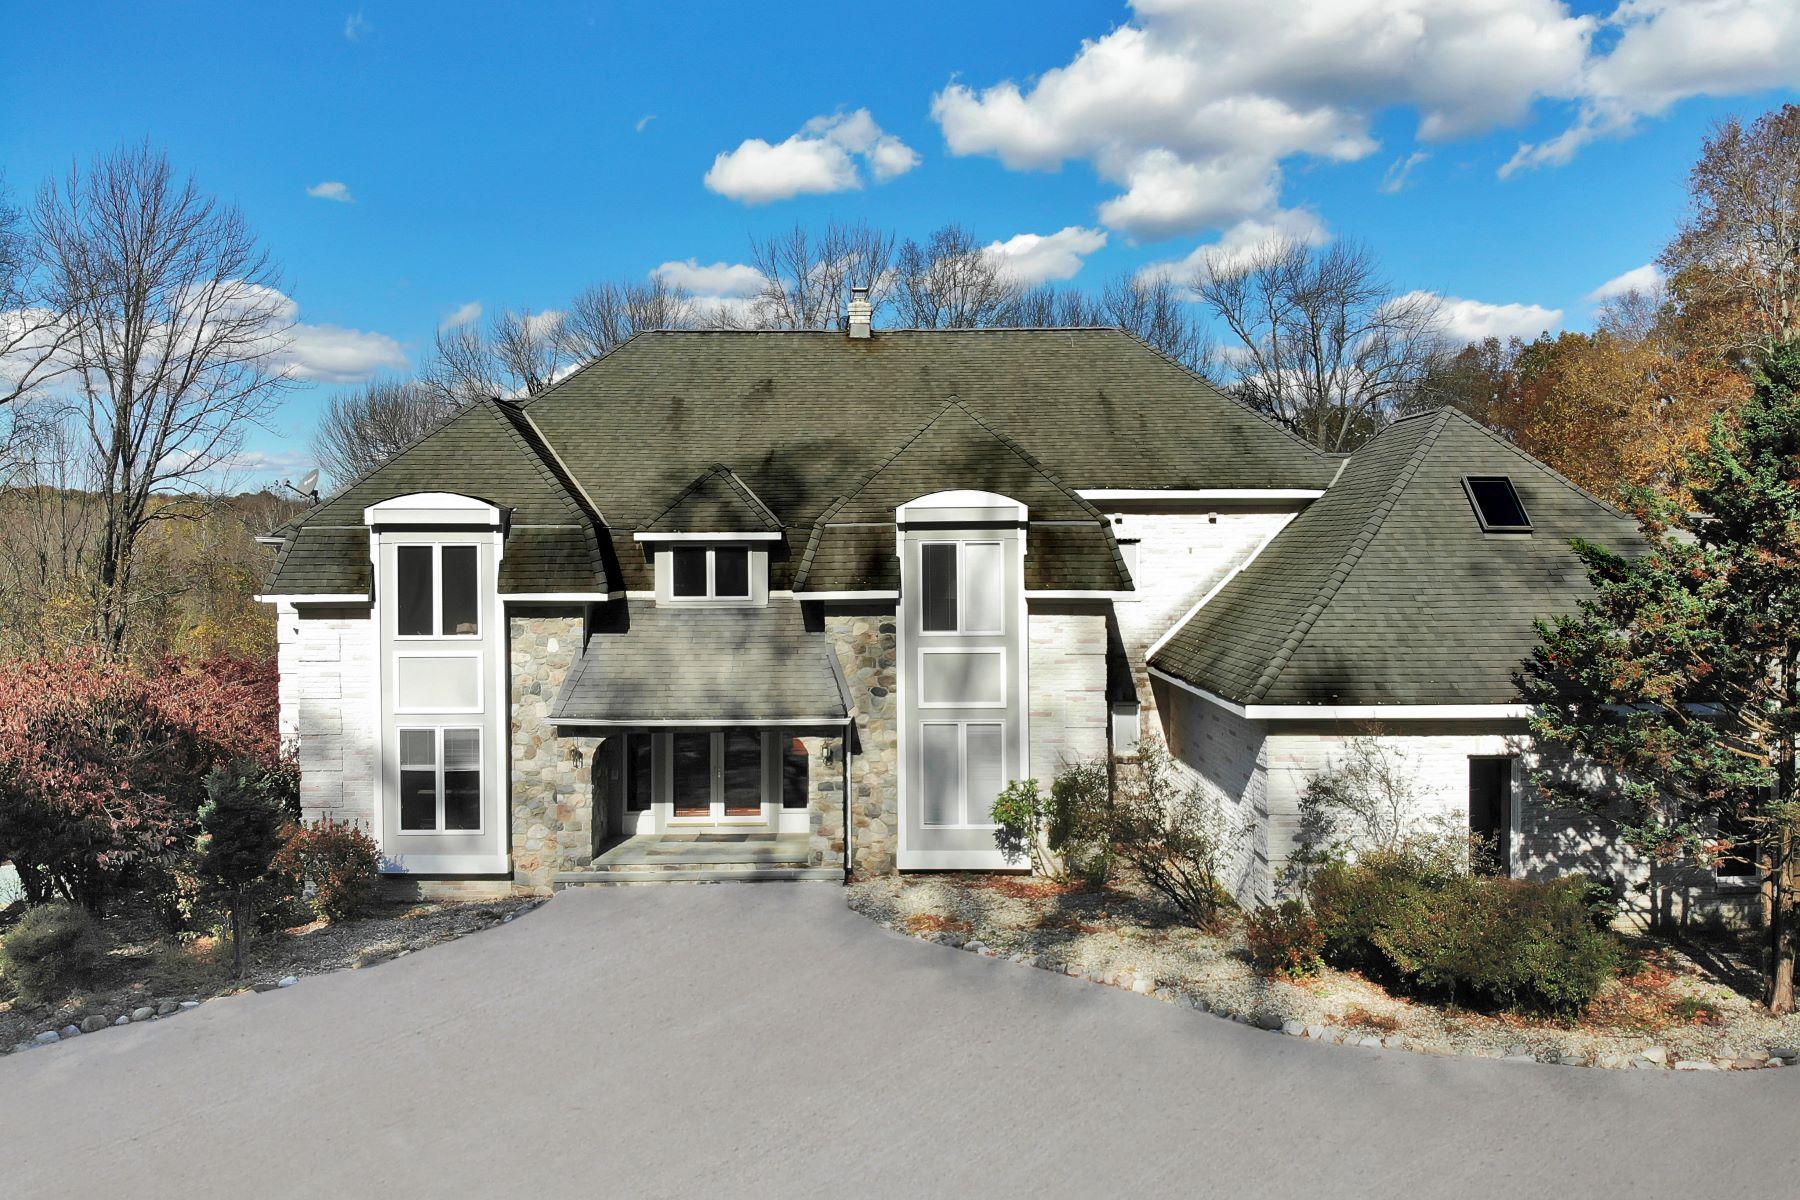 Single Family Homes por un Venta en 5 ACRE OASIS 647 W Mountain Rd. Sparta, Nueva Jersey 07871 Estados Unidos